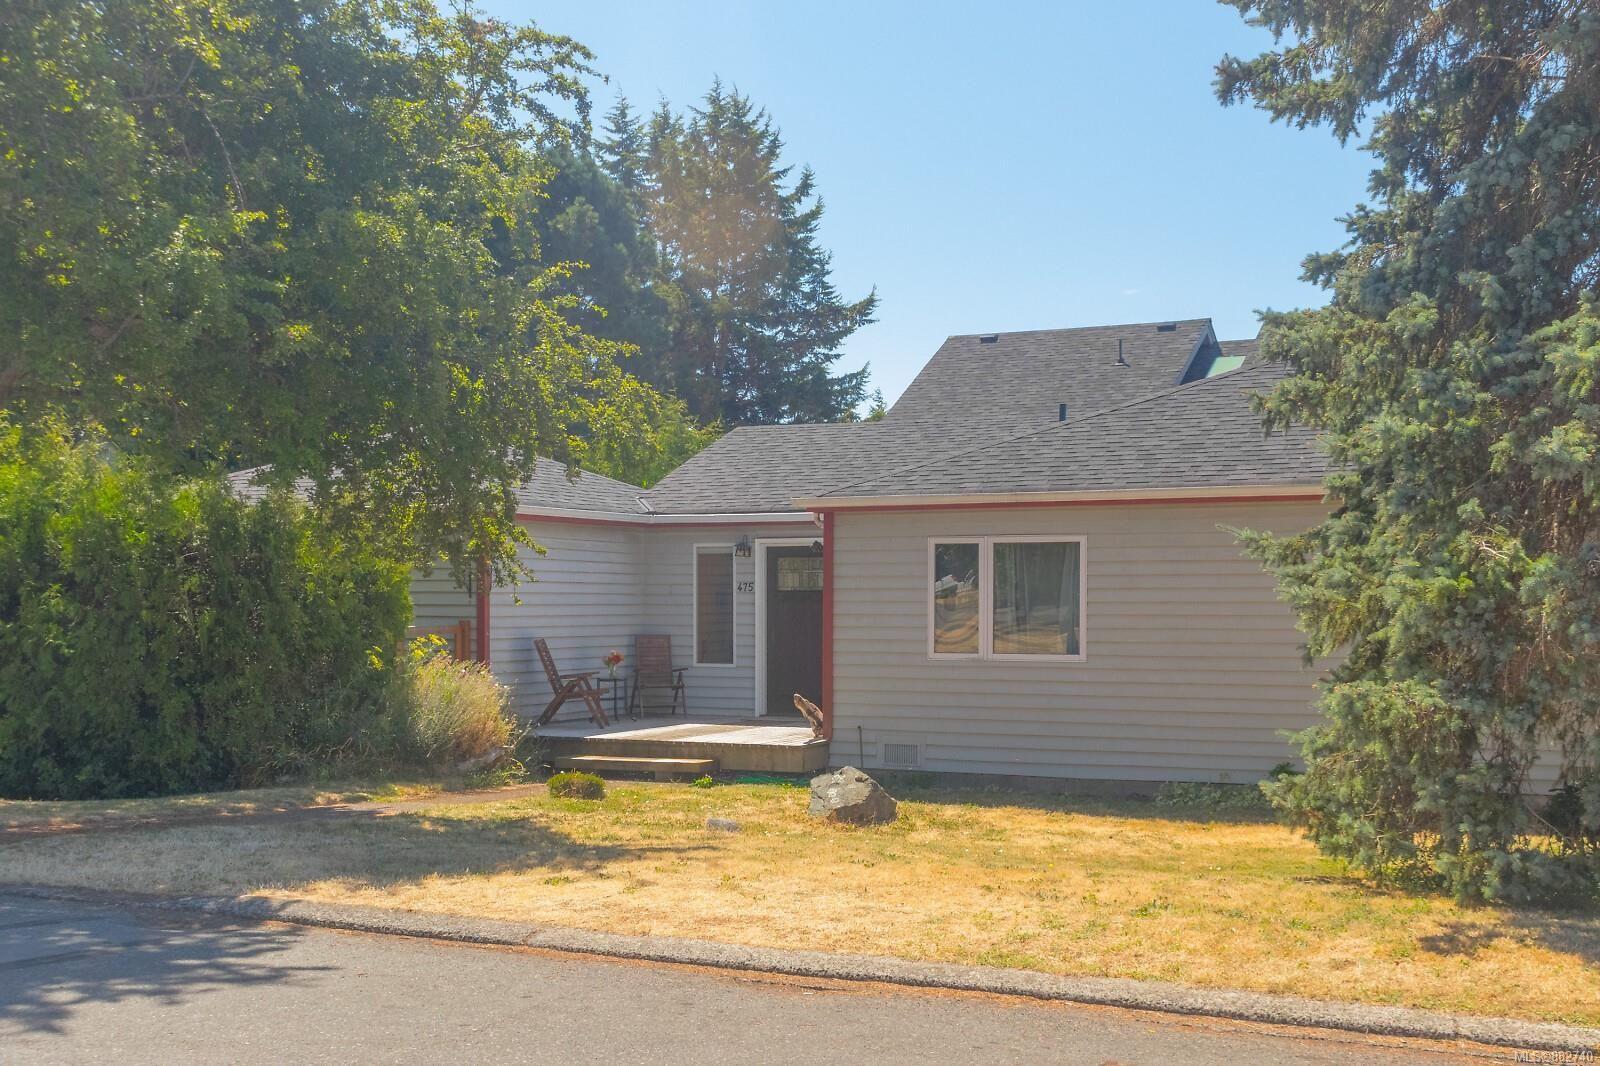 Main Photo: 475 Kinver St in : Es Saxe Point House for sale (Esquimalt)  : MLS®# 882740